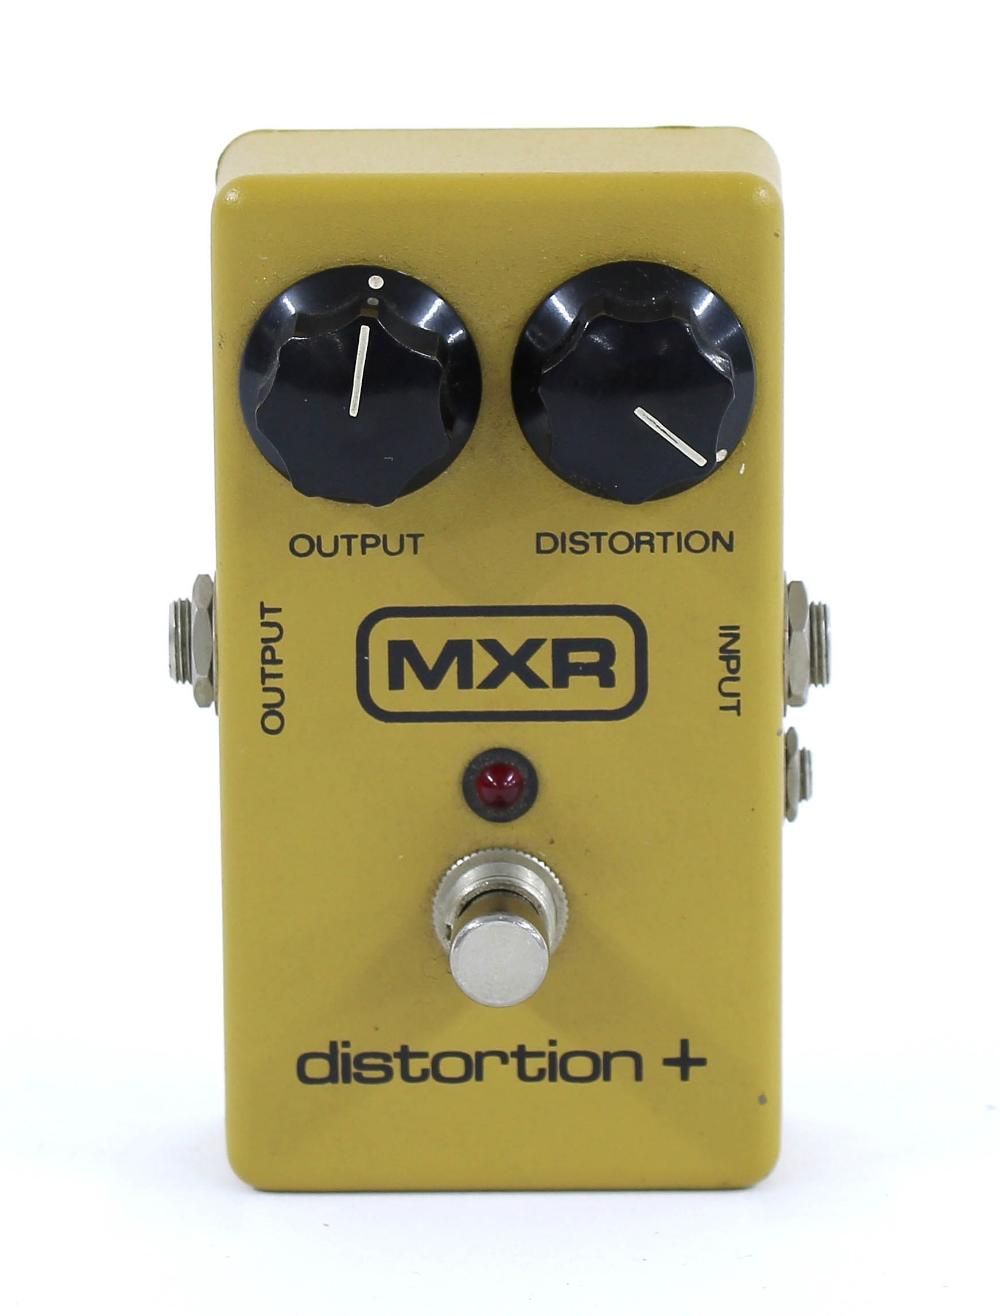 MXR Distortion+ guitar pedal